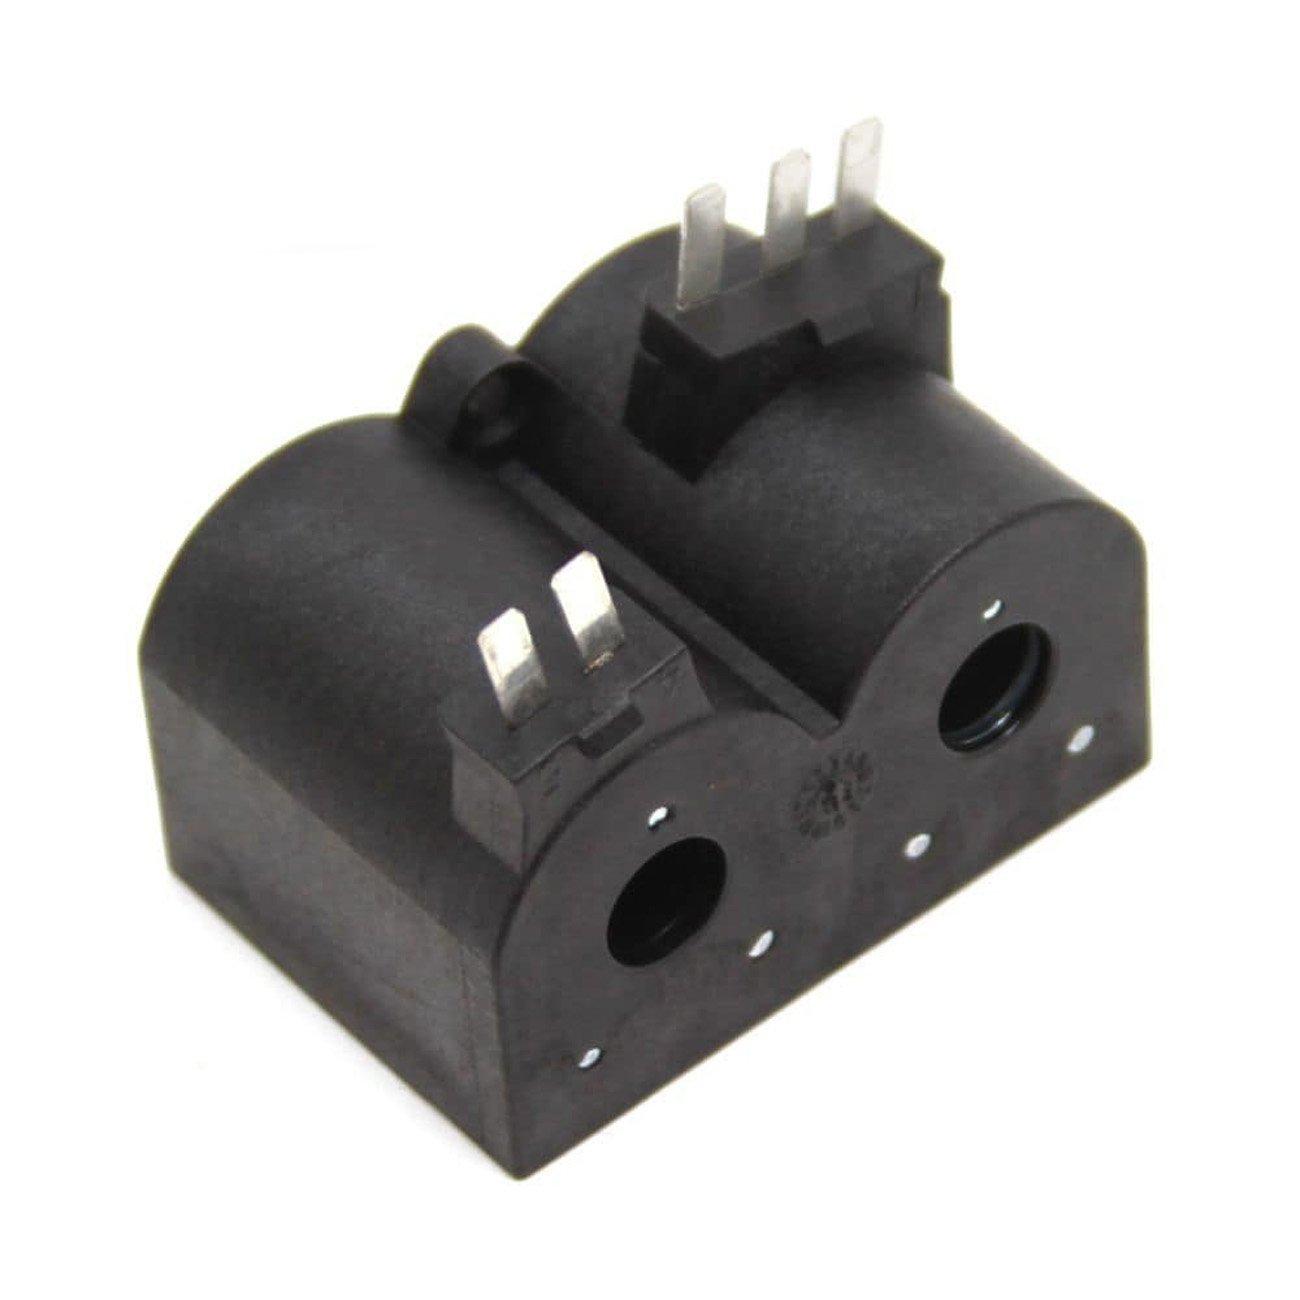 Siwdoy W10328463 Gas Dryer Coil Kit for Whirlpool Sears AP5177867 PS3494728 WPW10328463